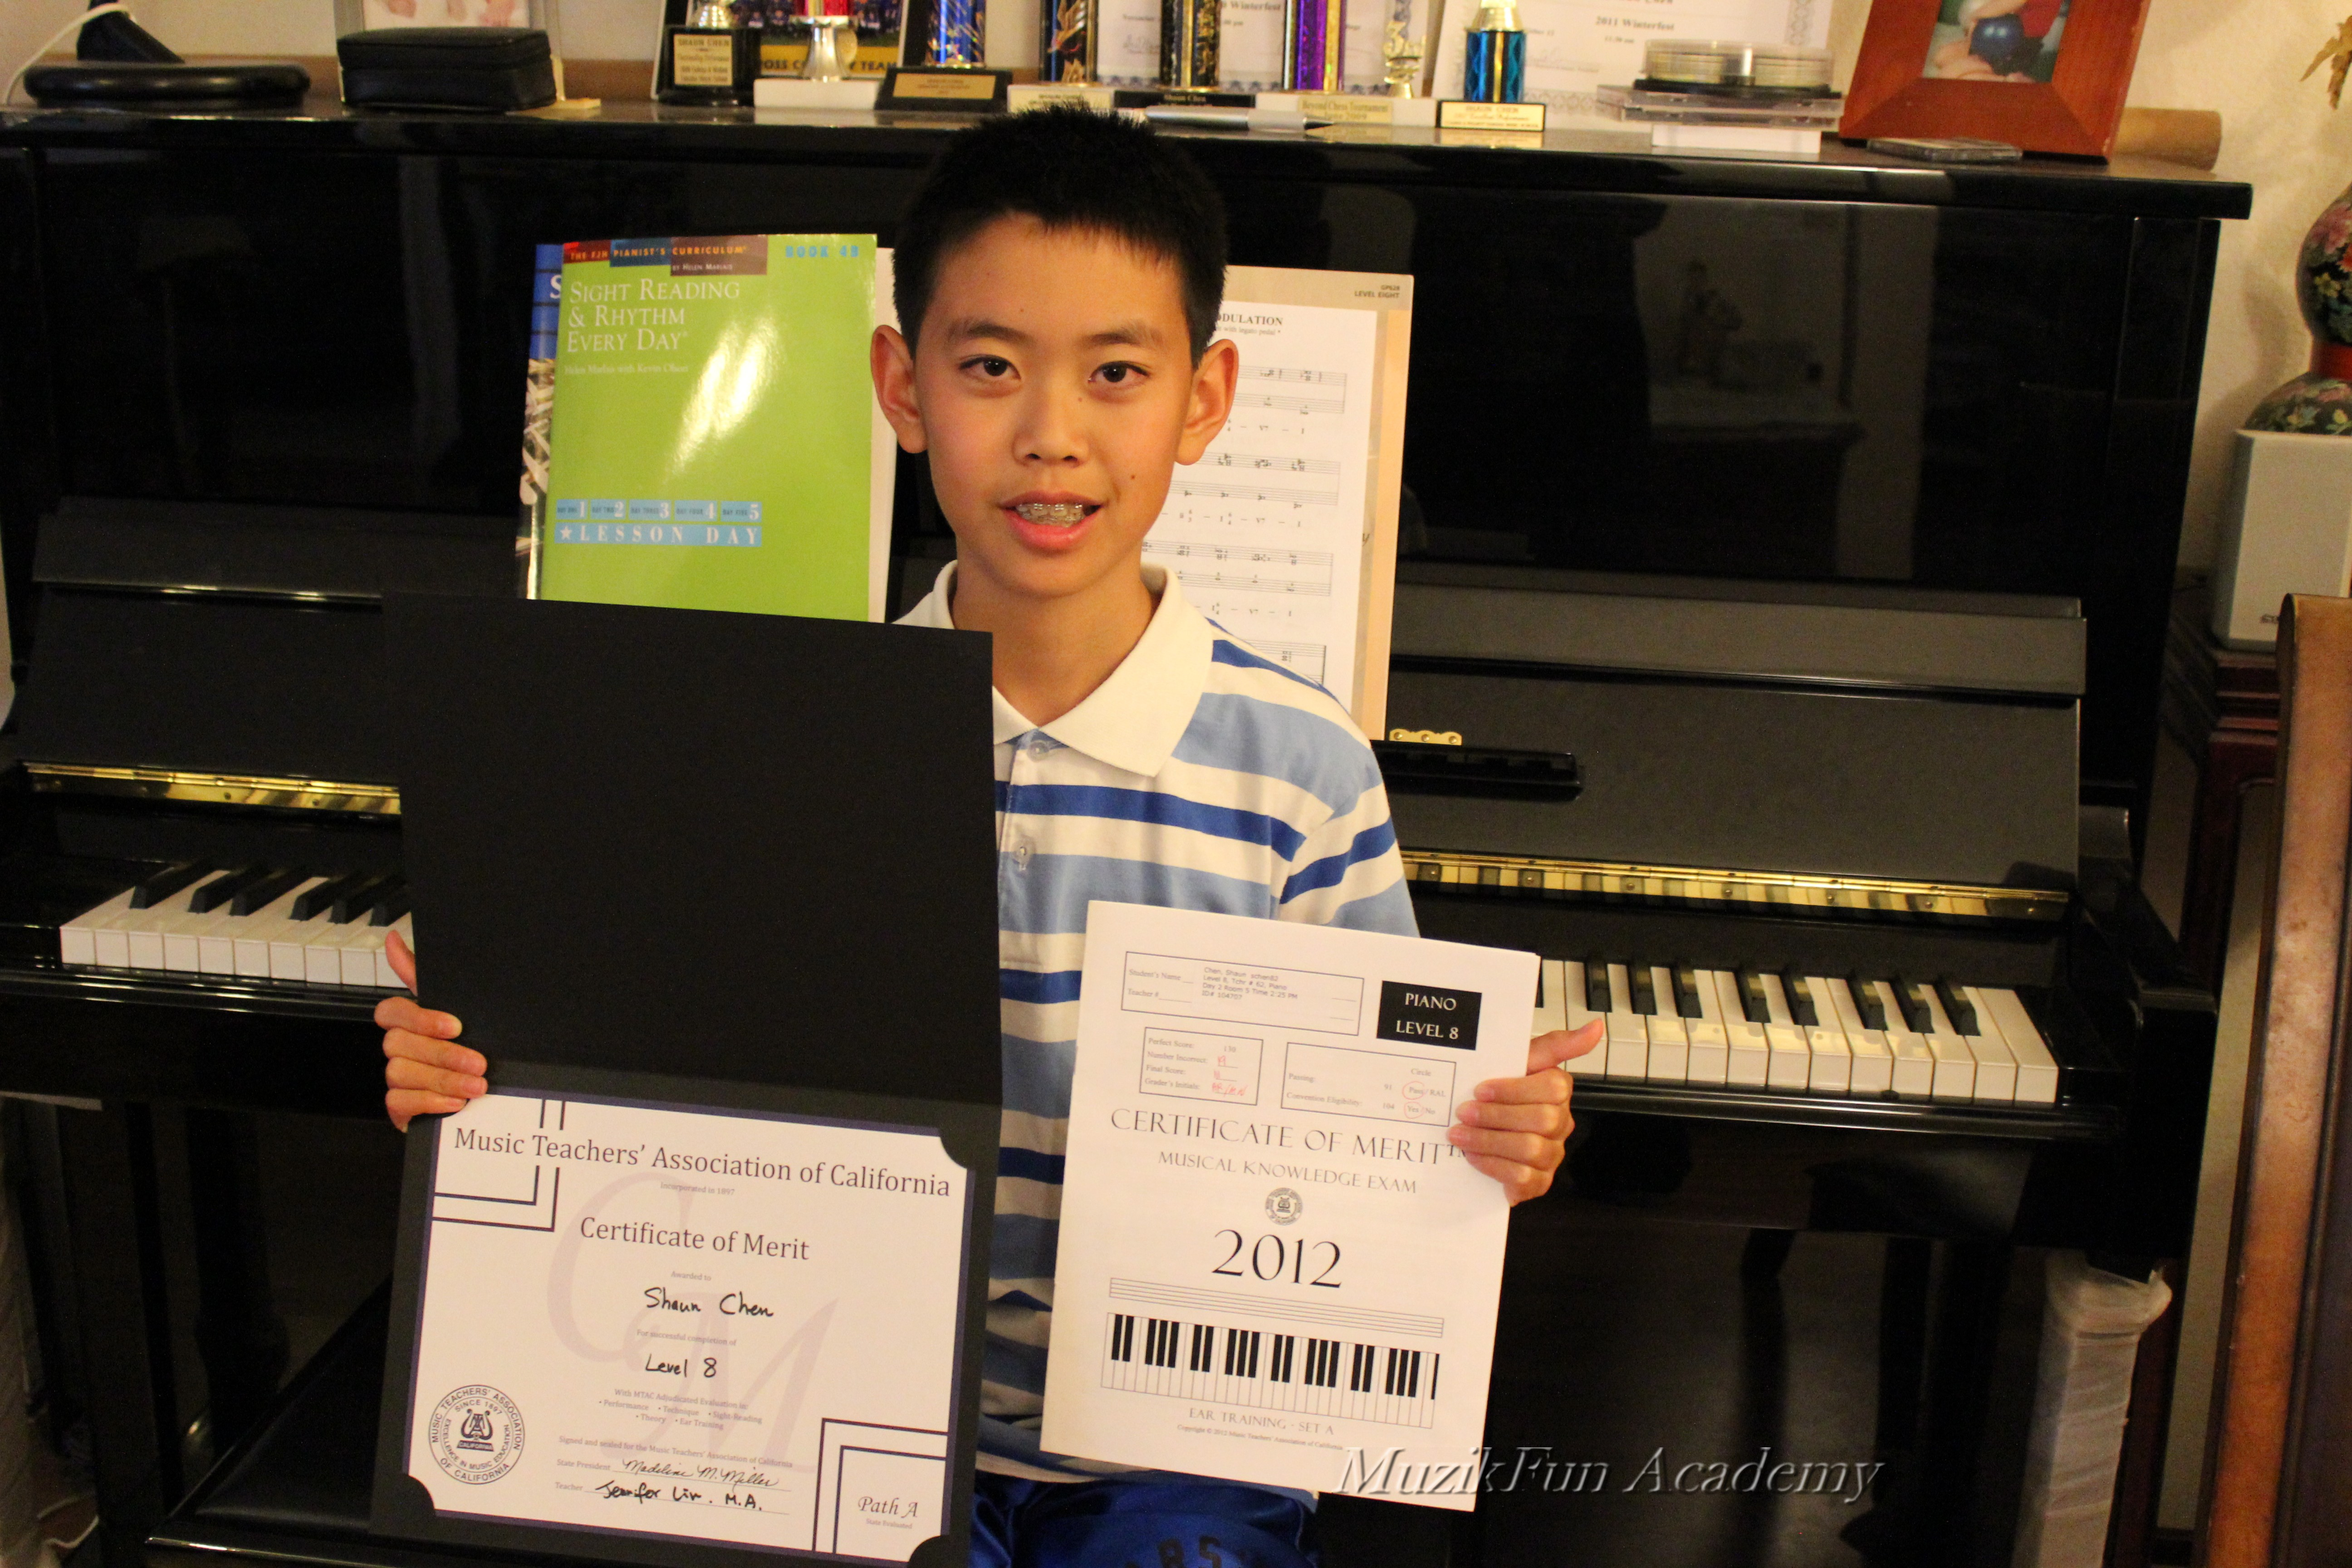 Certificate of merit cm muzikfun education shaun chen 6th grade cm level 8 xflitez Images